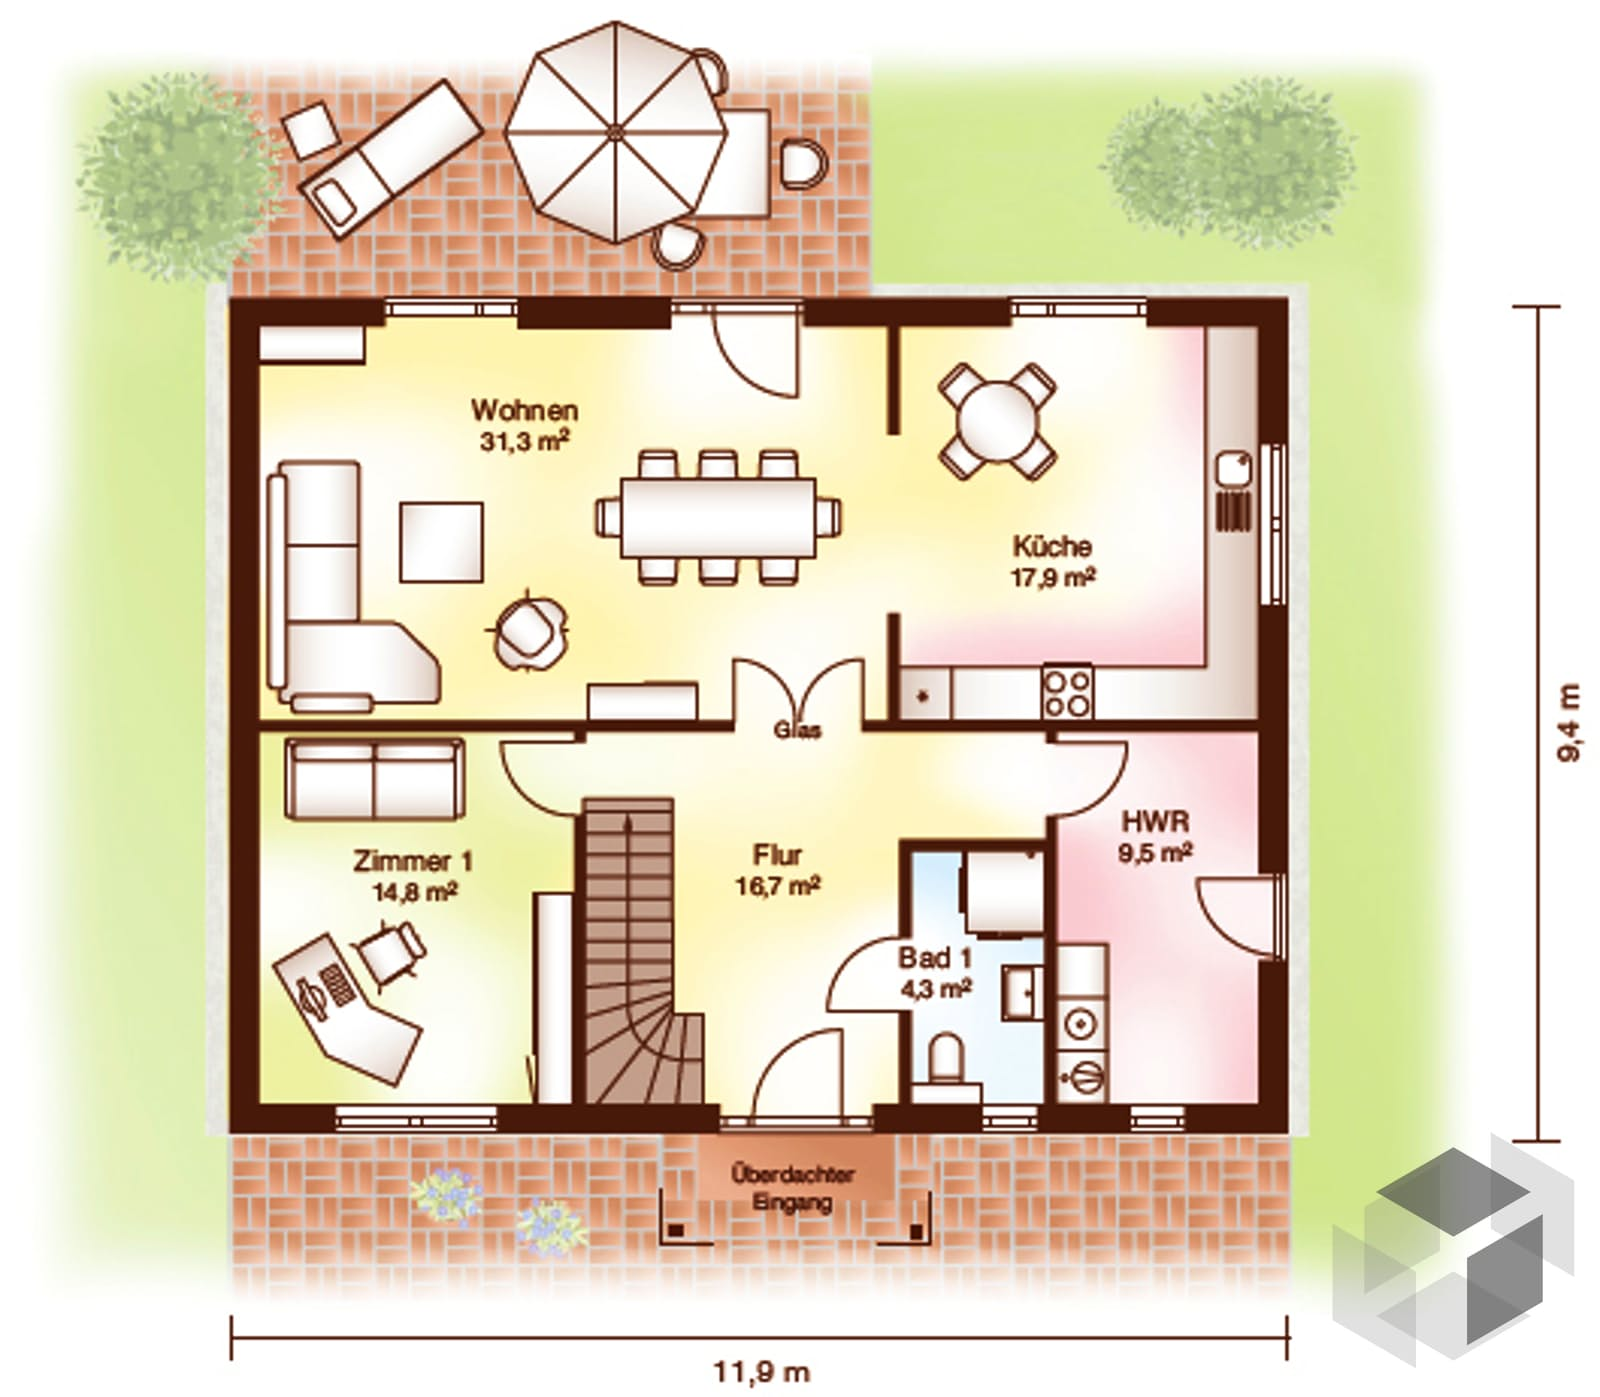 helsing r von fjorborg h user komplette daten bersicht. Black Bedroom Furniture Sets. Home Design Ideas